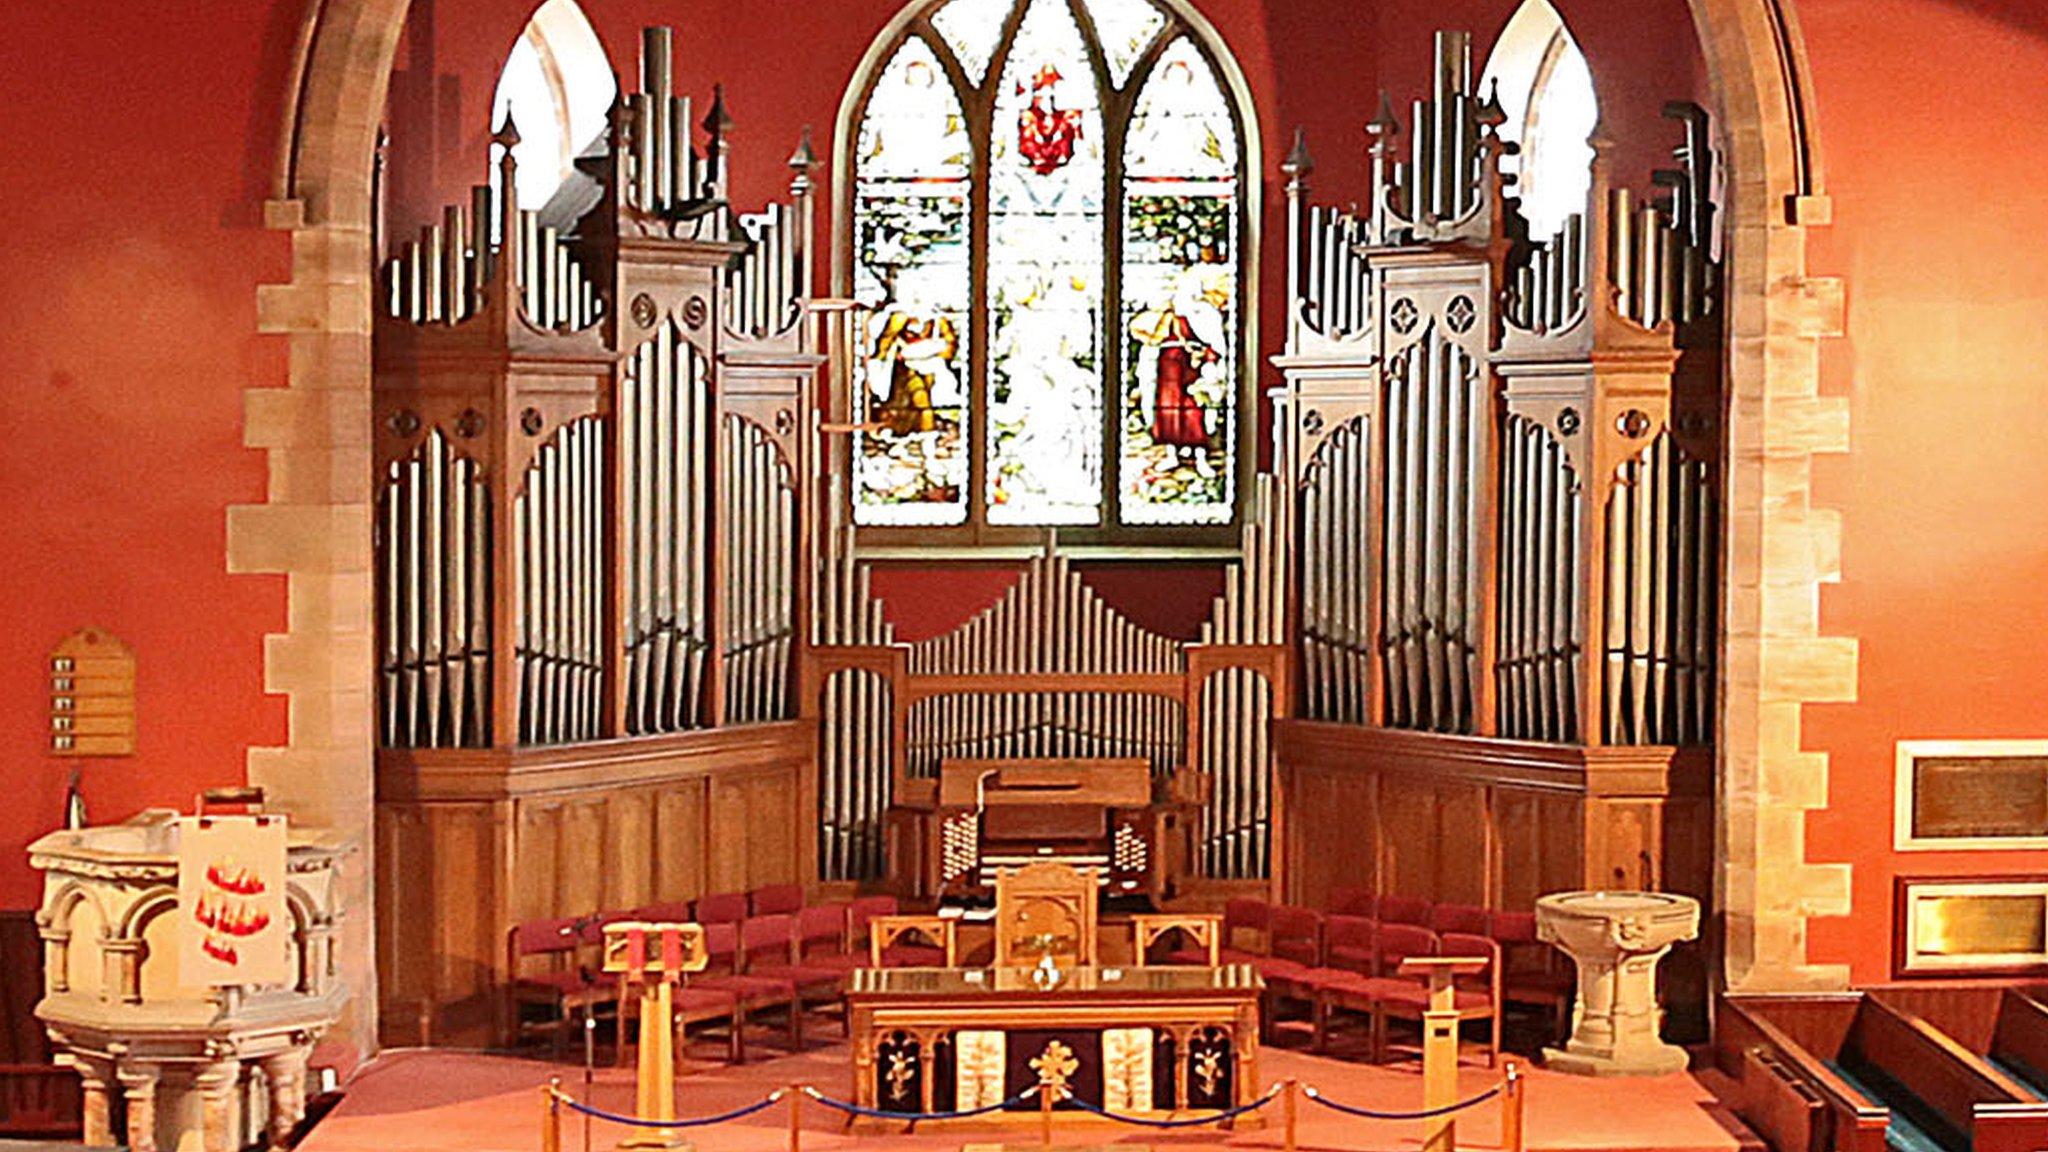 'Wonderful' church organ sent to Germany